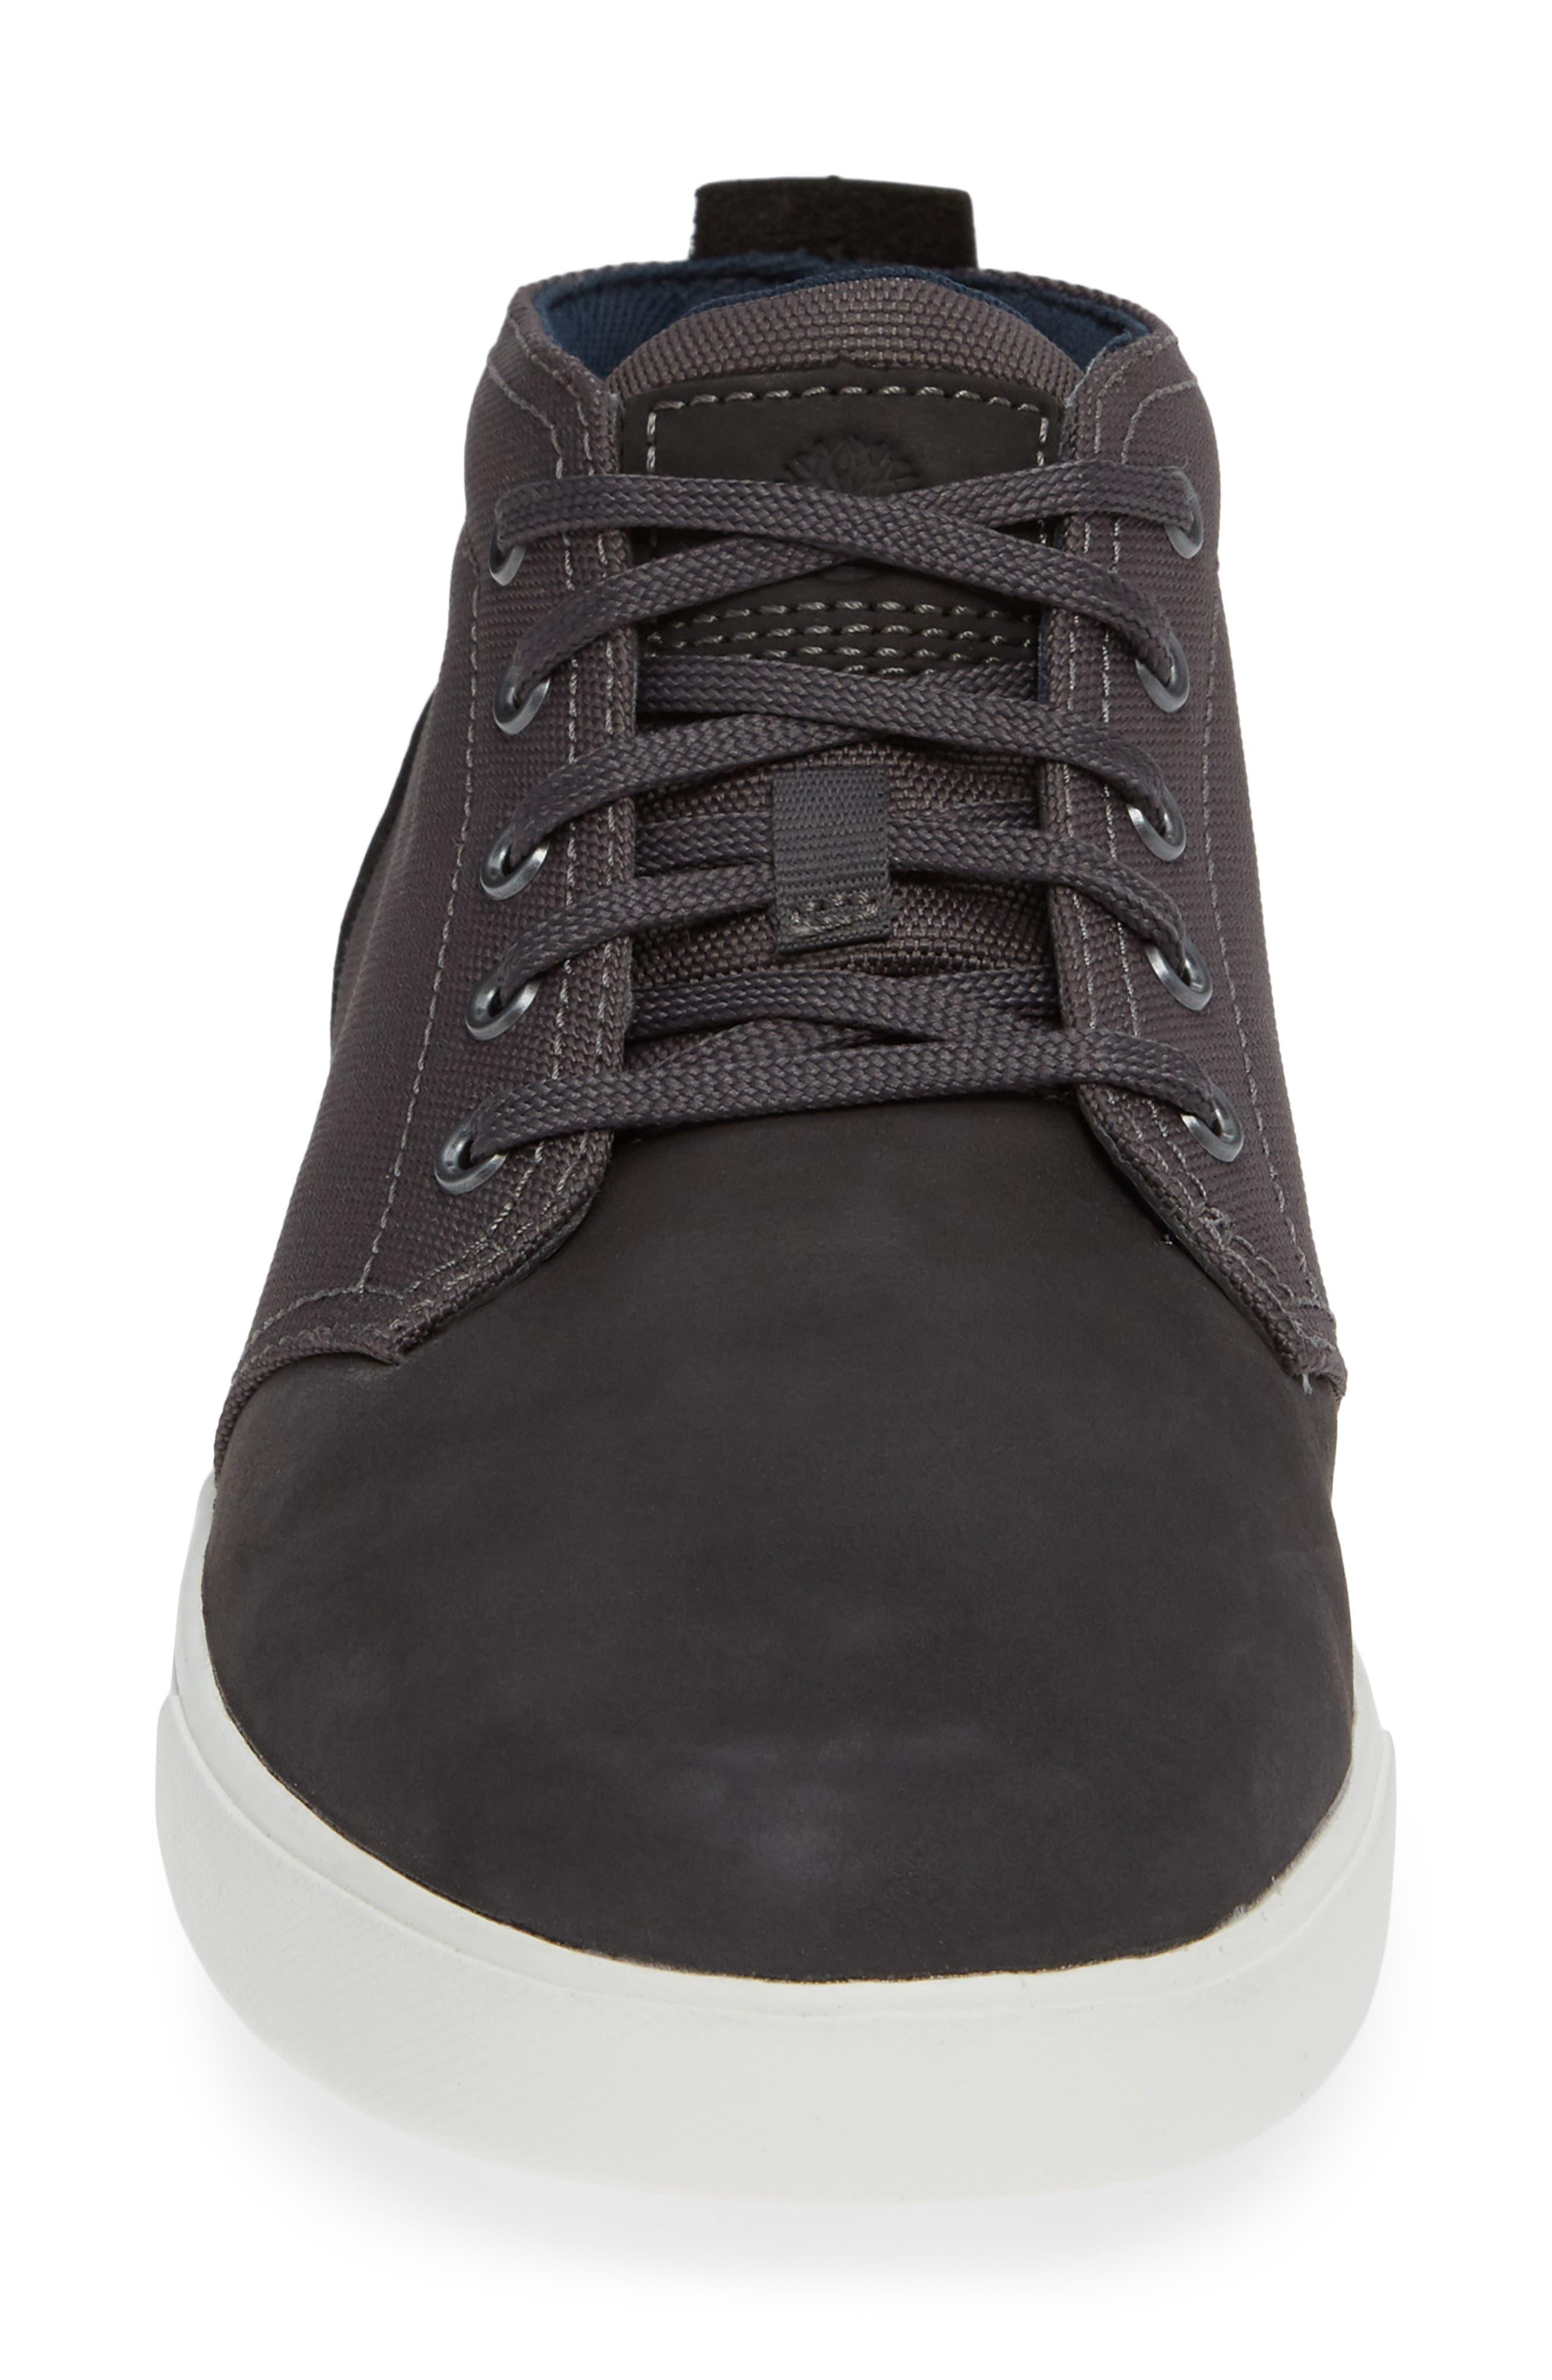 Earthkeepers<sup>®</sup> 'Groveton' Chukka Sneaker,                             Alternate thumbnail 4, color,                             CHARCOAL